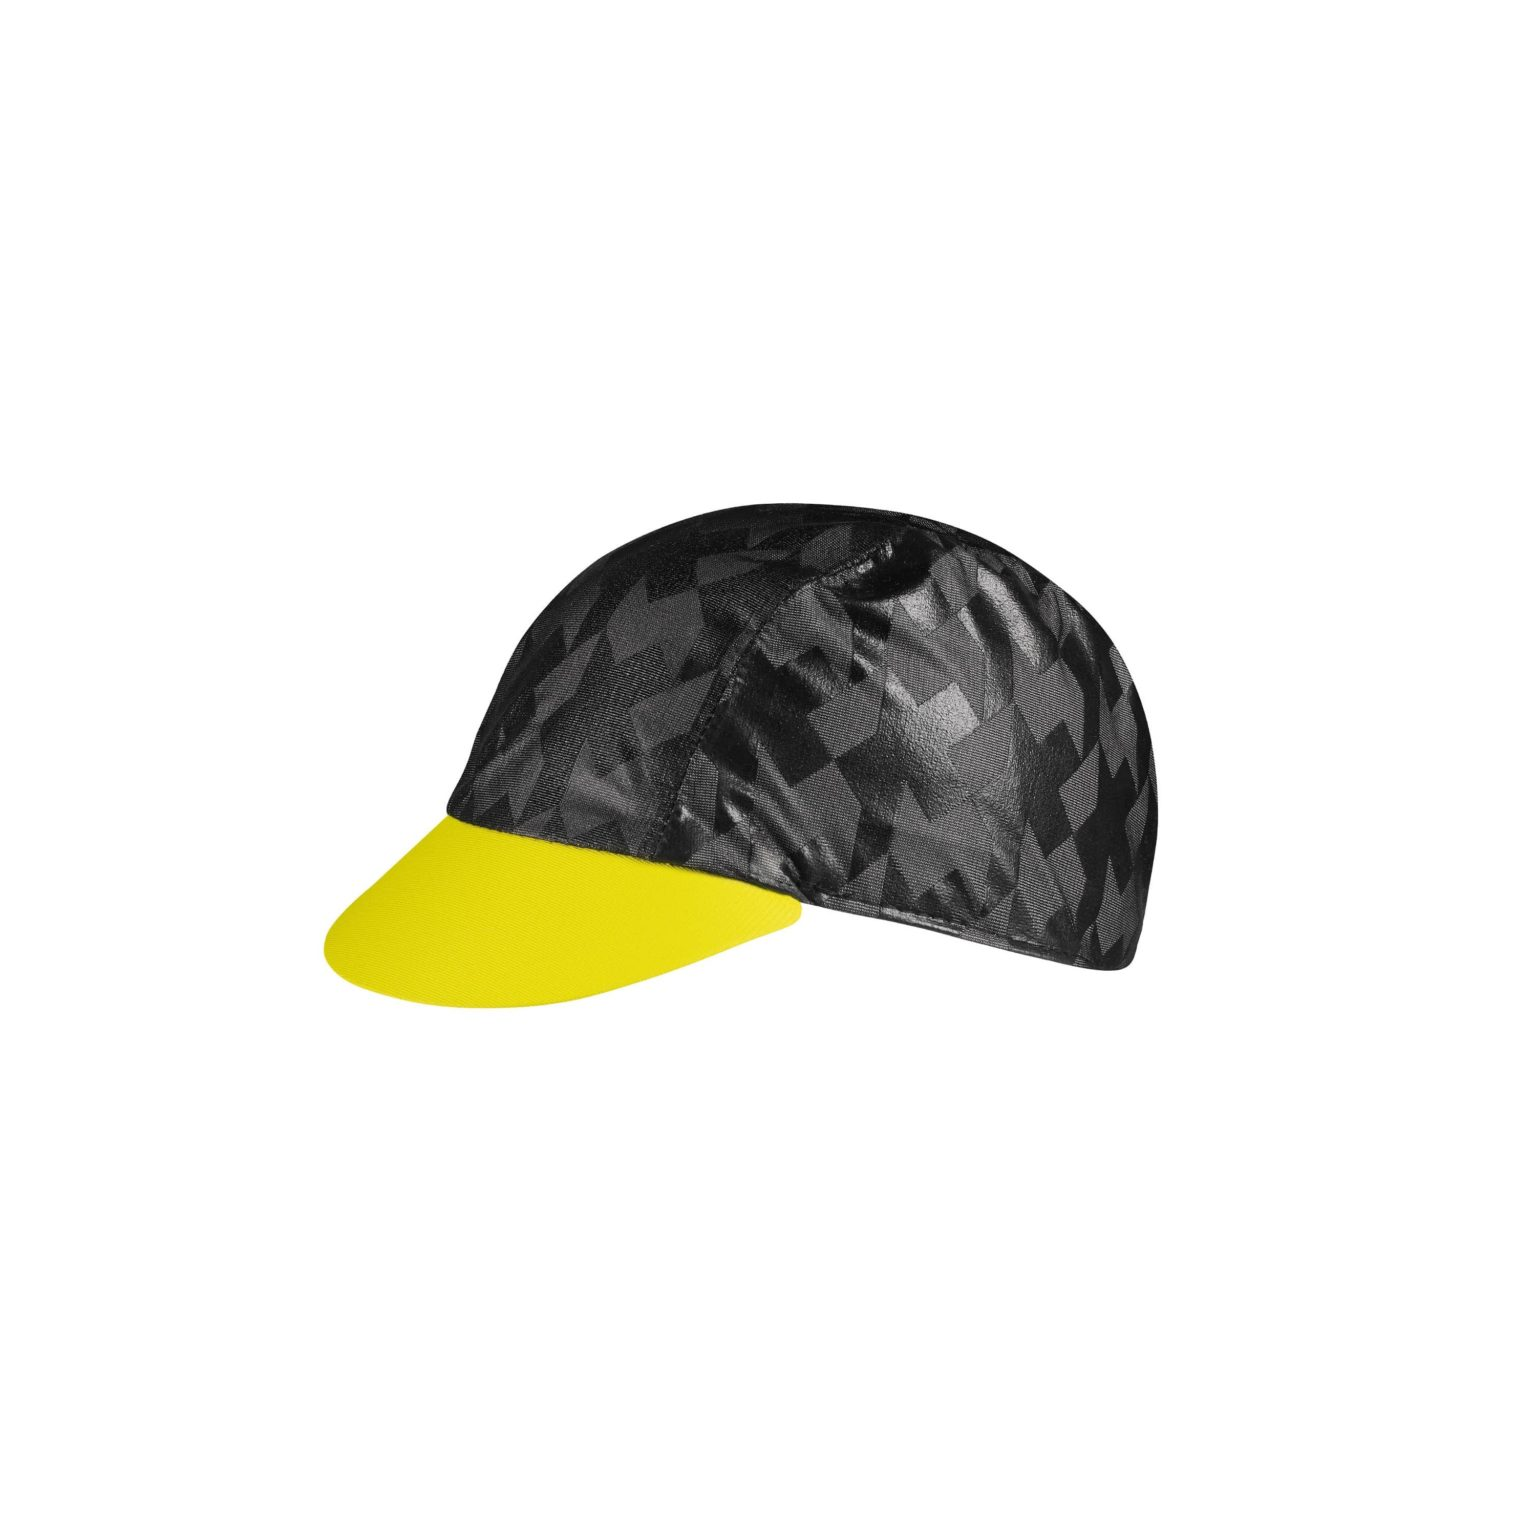 EQUIPE RS Rain Cap Fluo Yellow 1 F Fotor